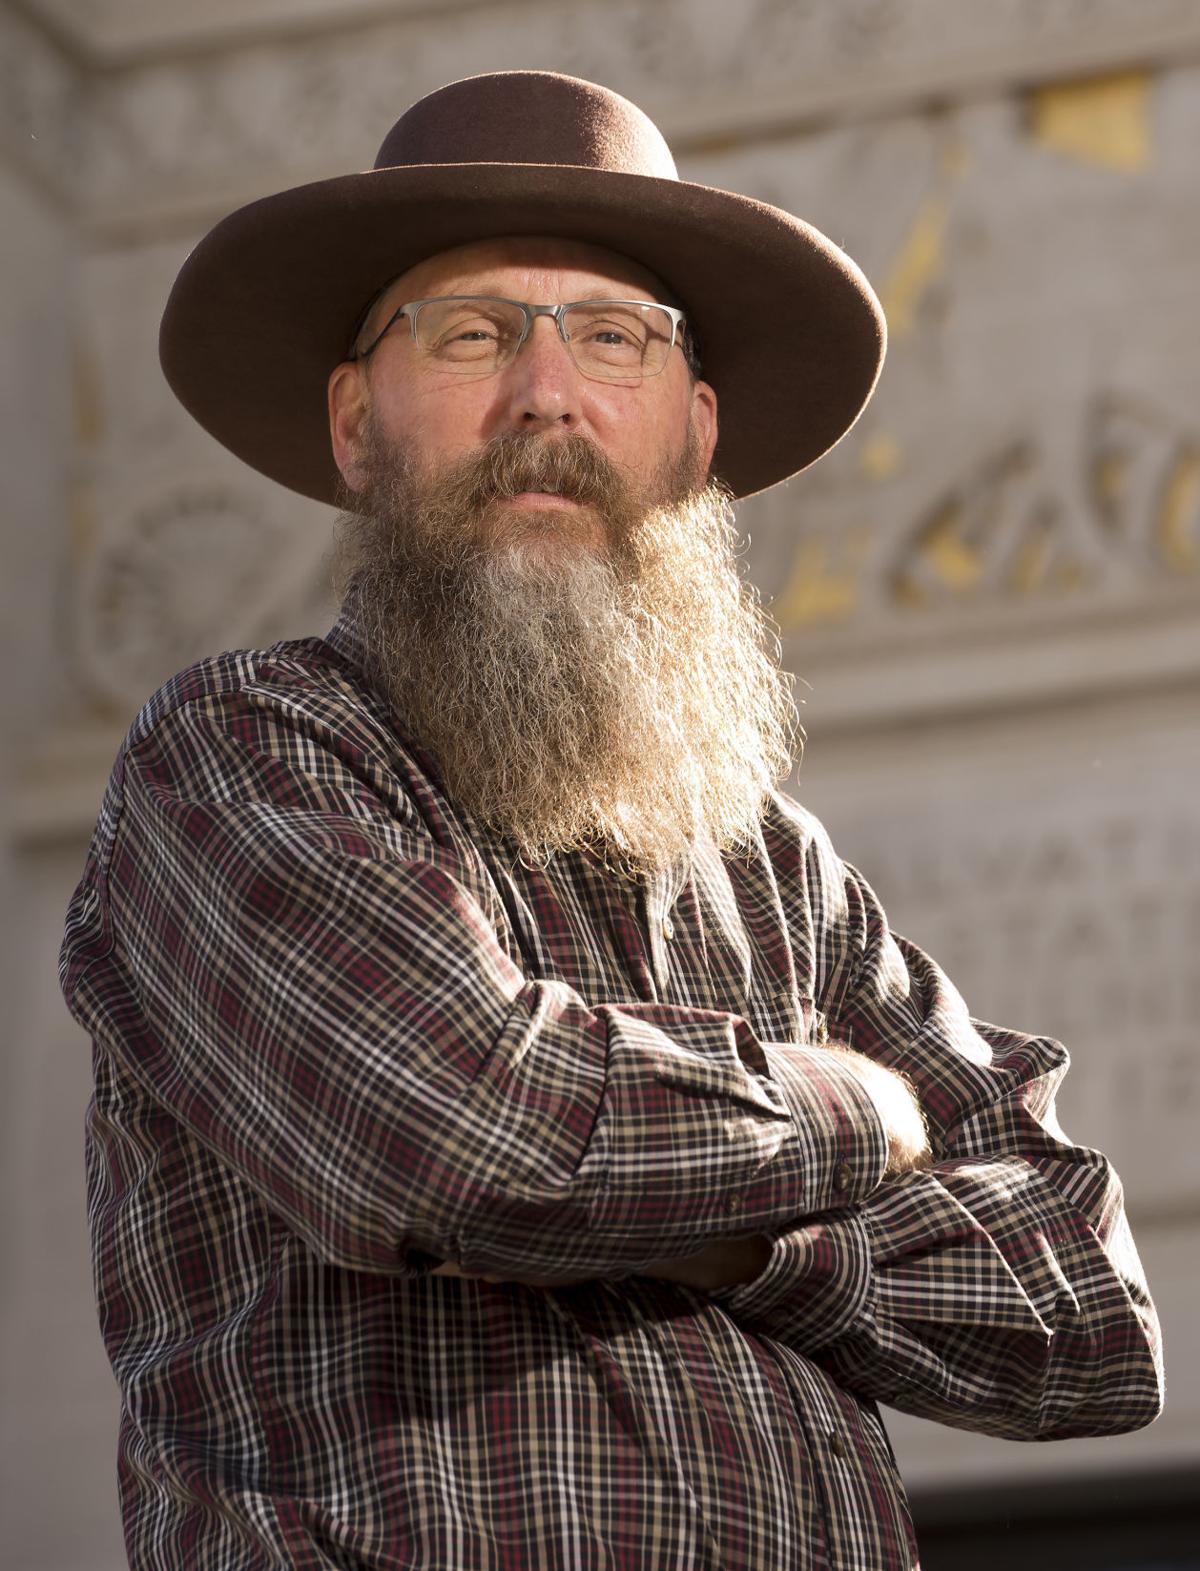 Calling all Nebraska beards to the Capitol aeaaebacec3c